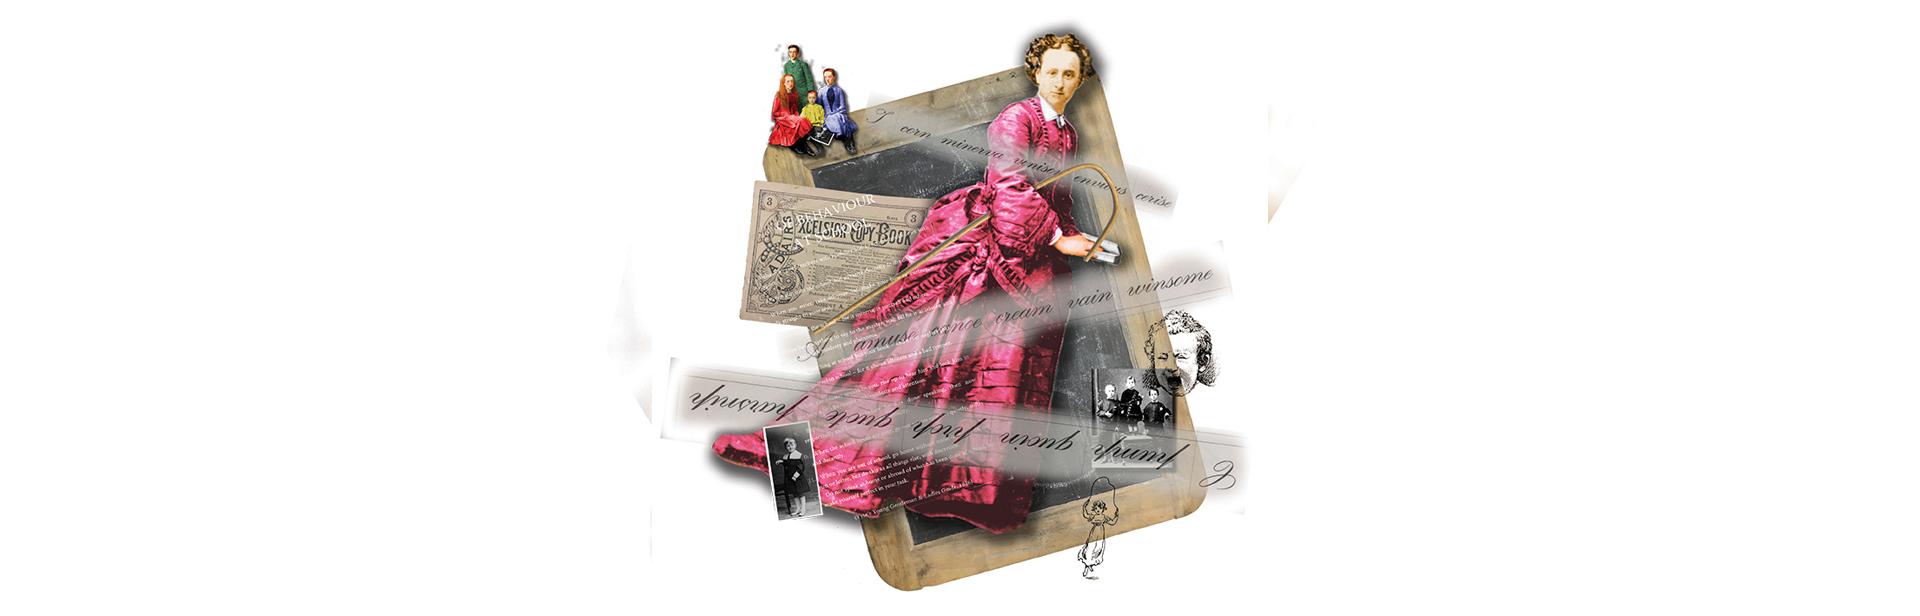 Mrs Sargood - Incursion